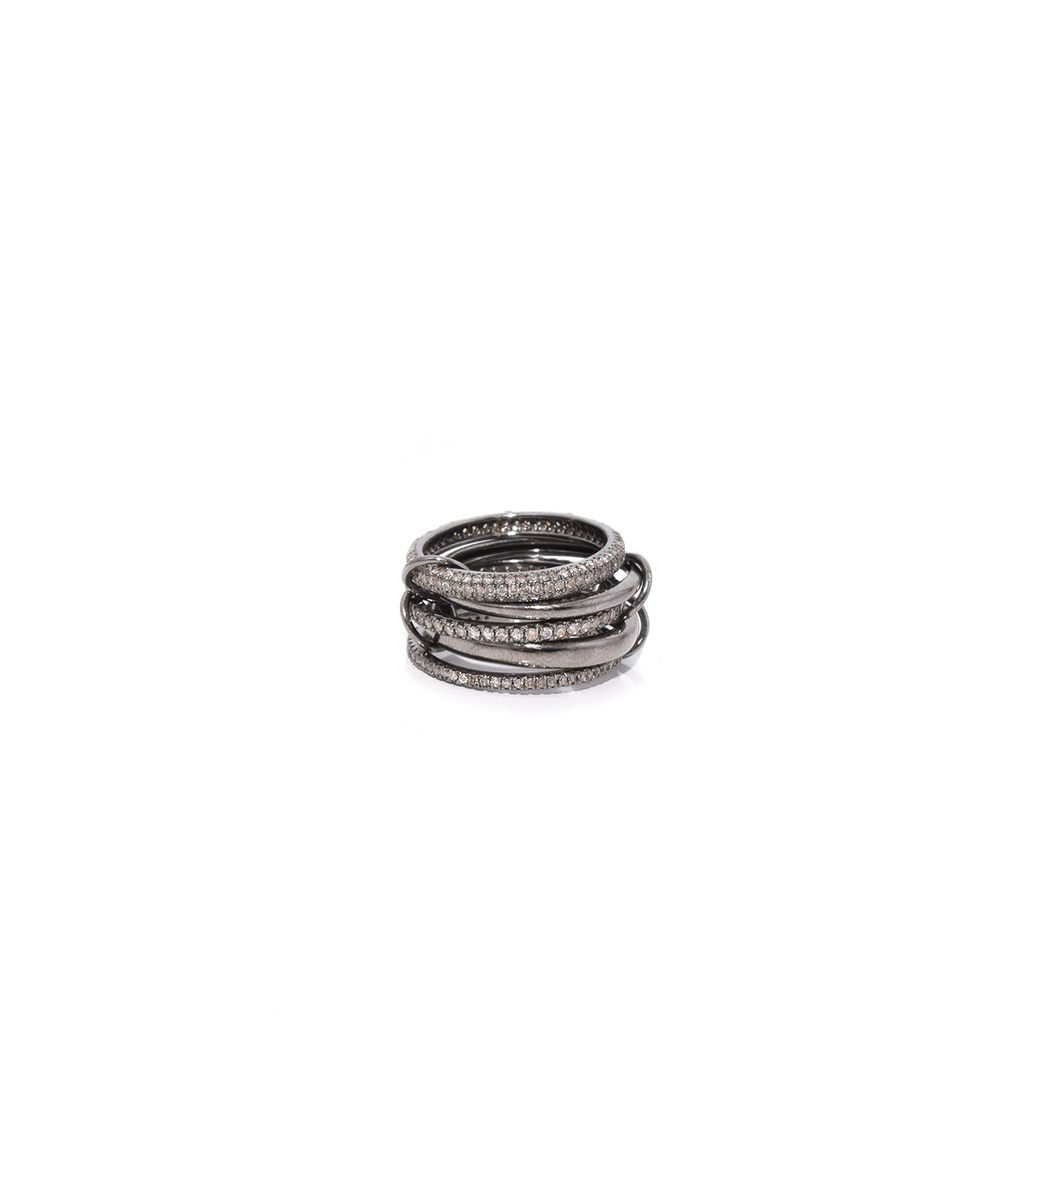 THEODOSIA 5 Part Oxidized Silver Ring